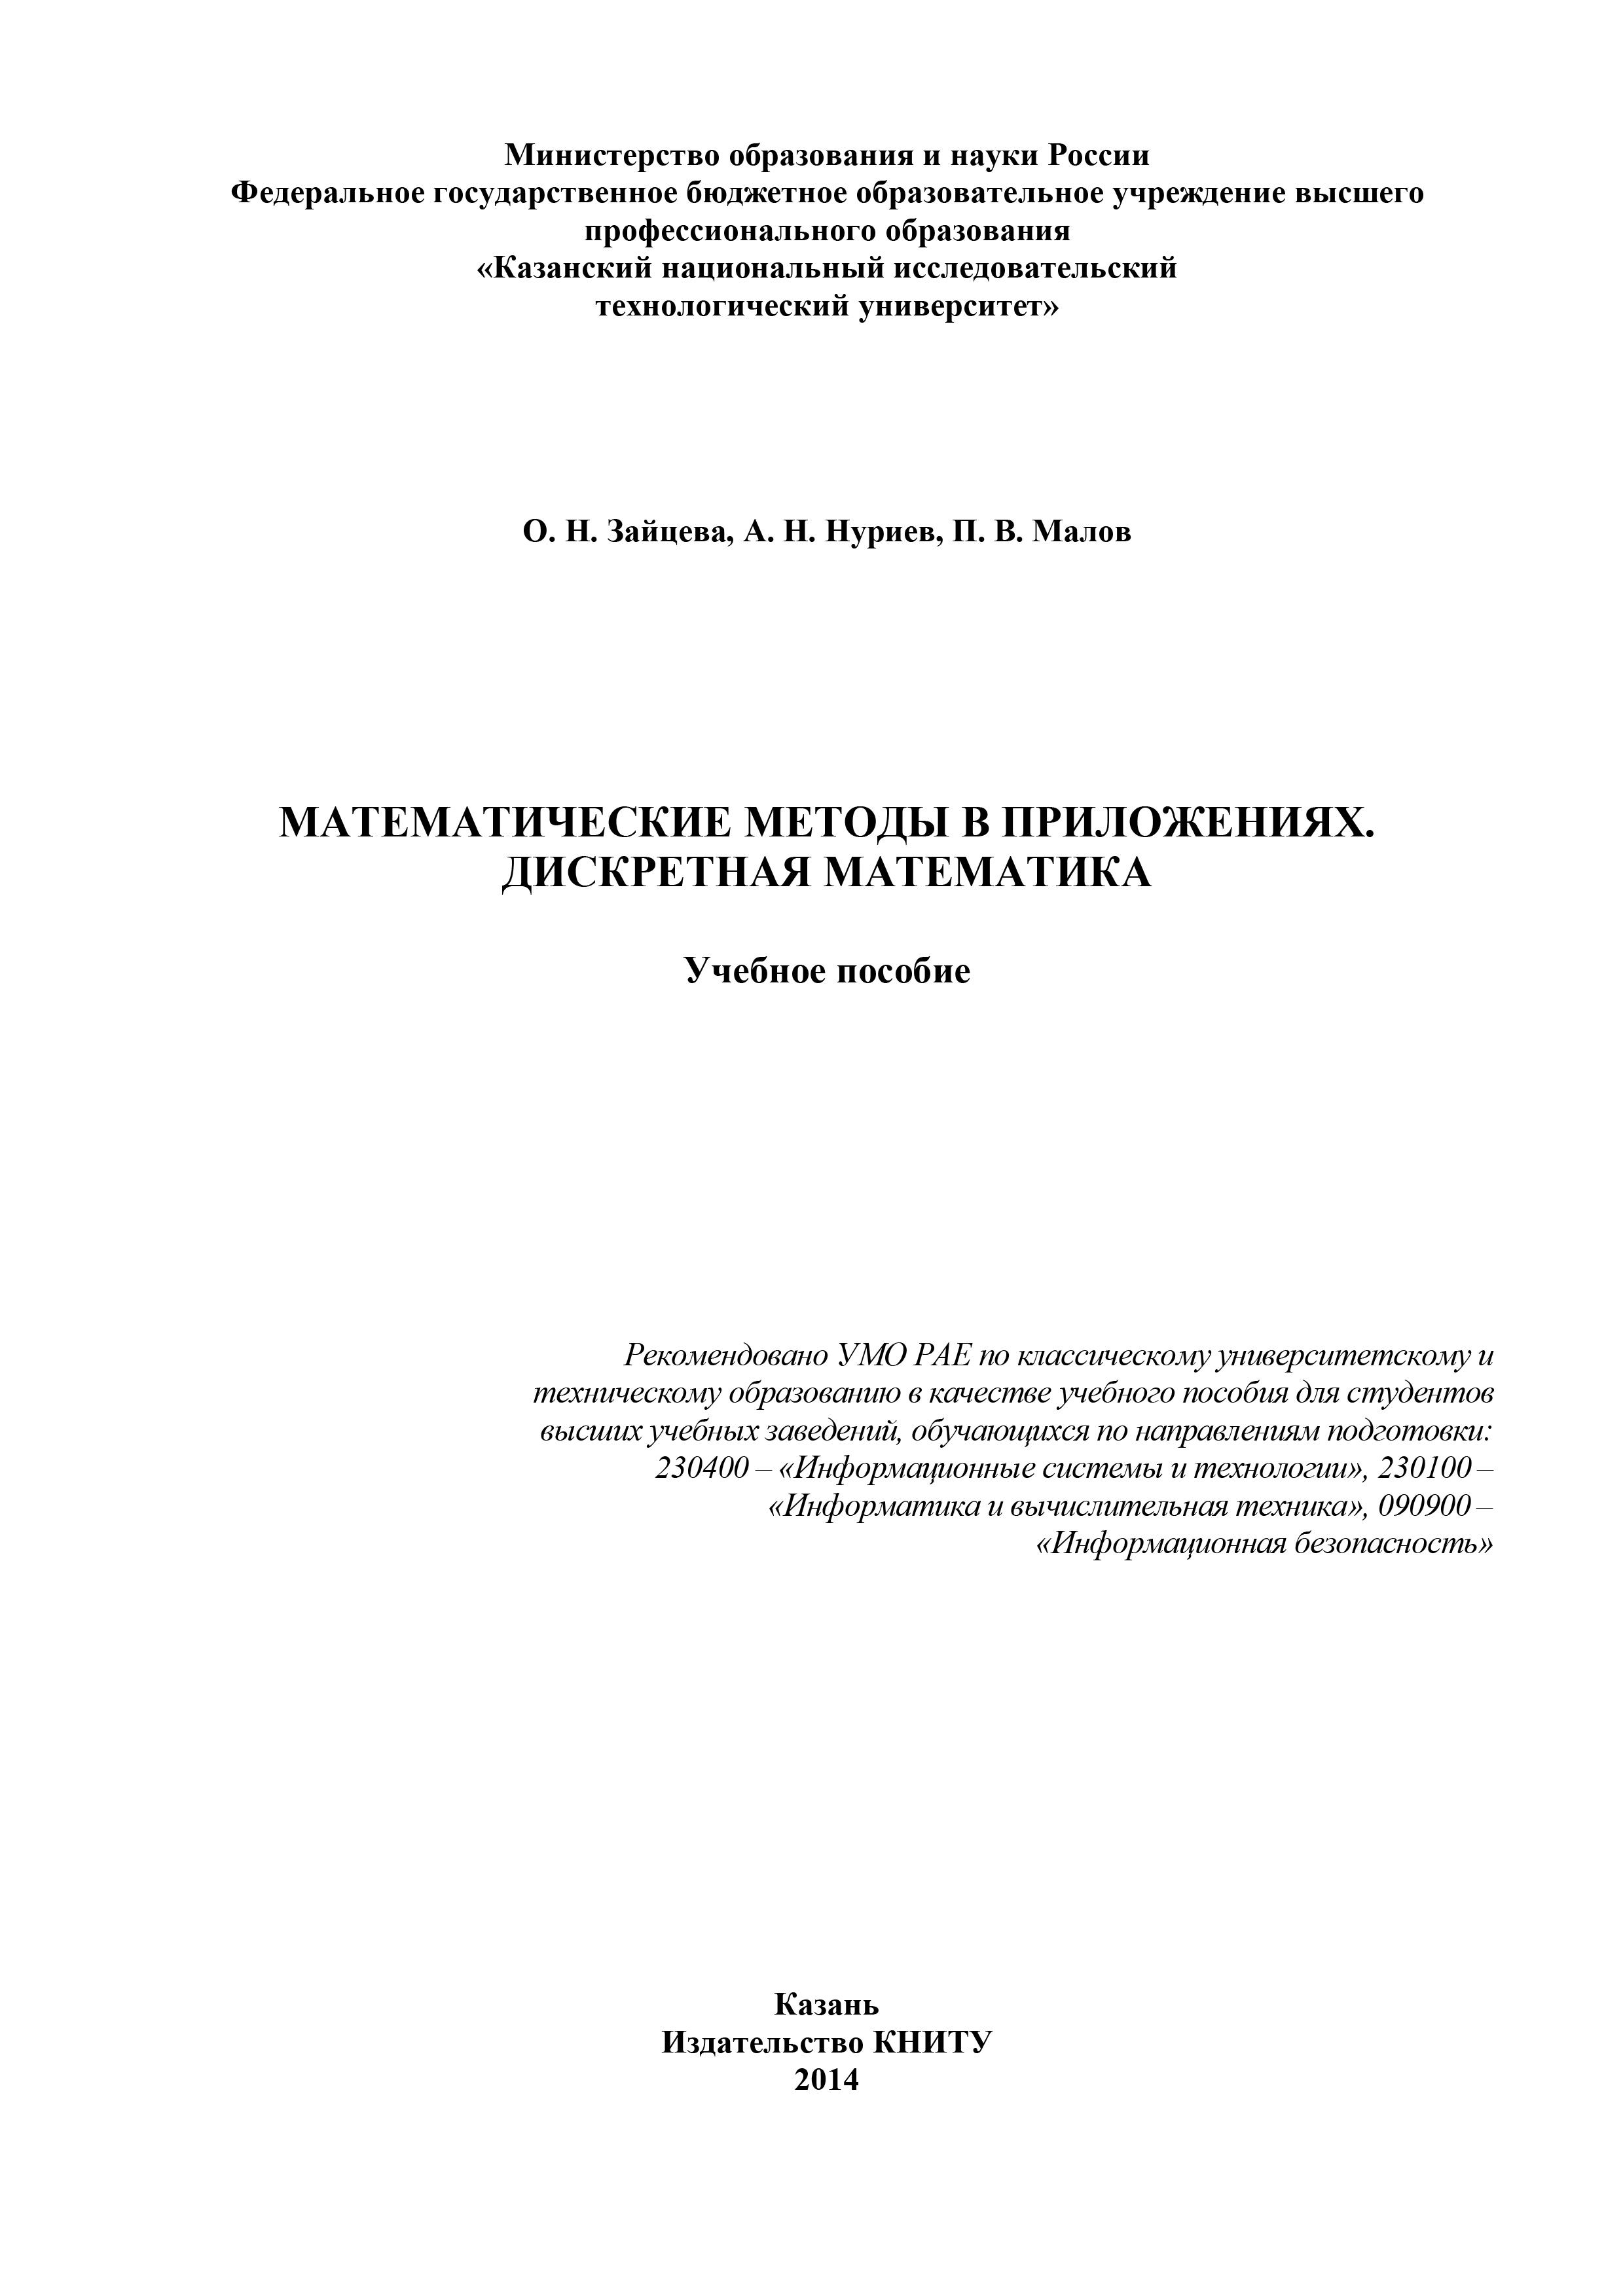 О. Н. Зайцева Математические методы в приложениях. Дискретная математика цена